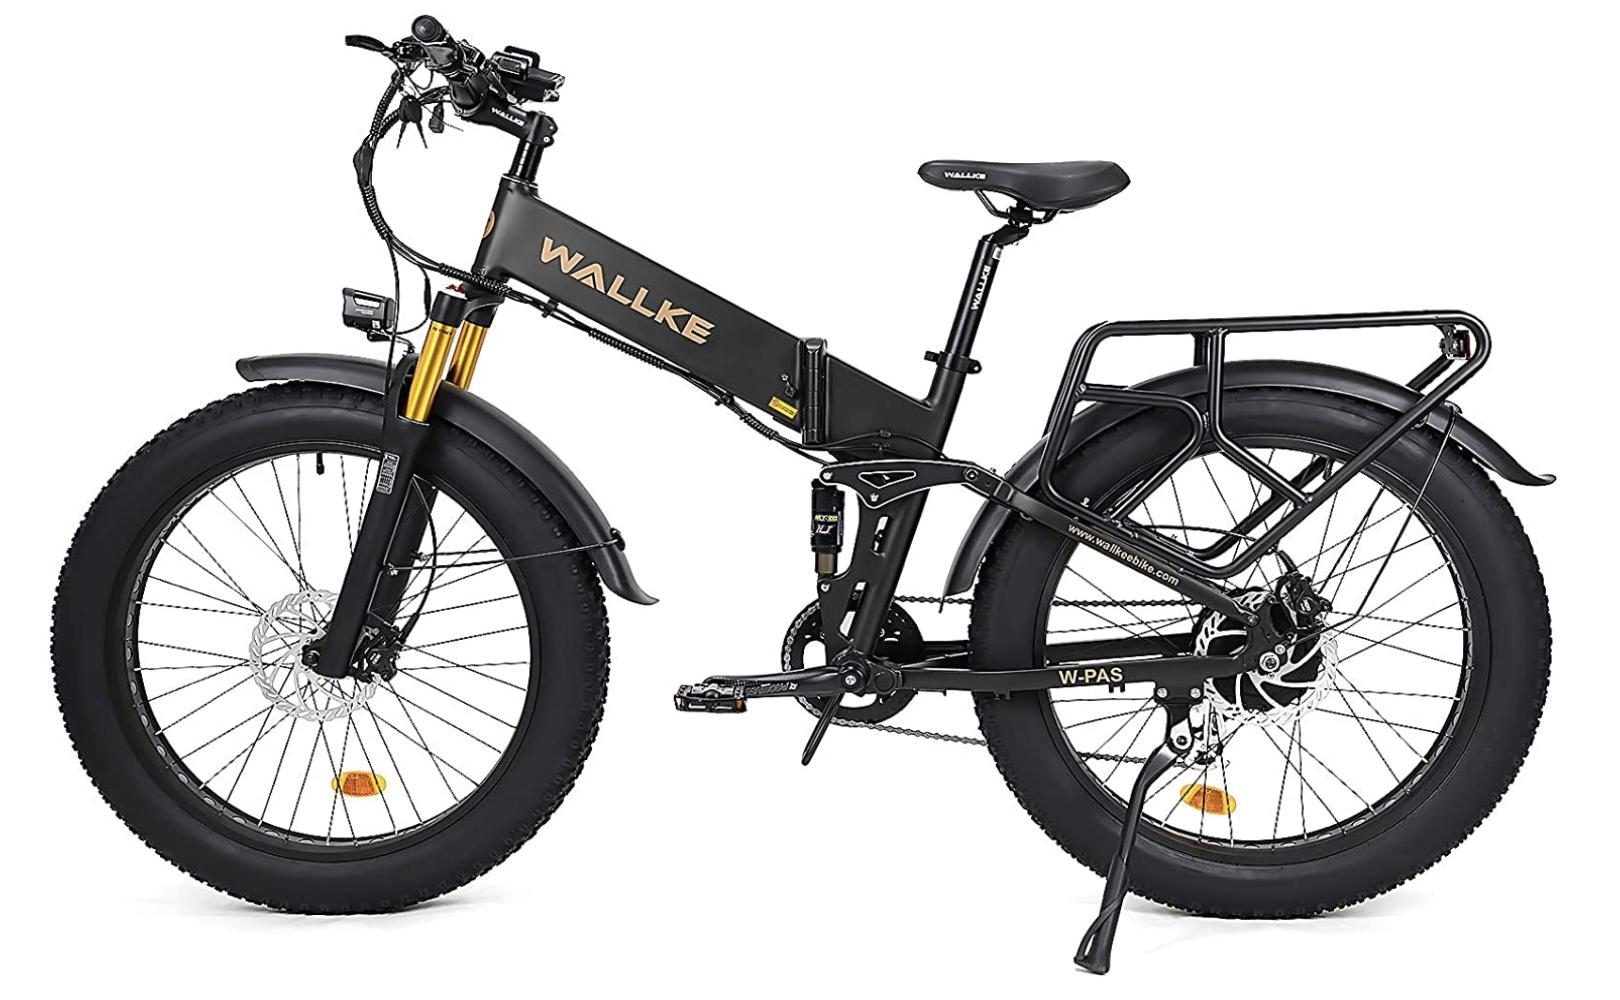 W Wallke X3 Pro26 Electric Bike